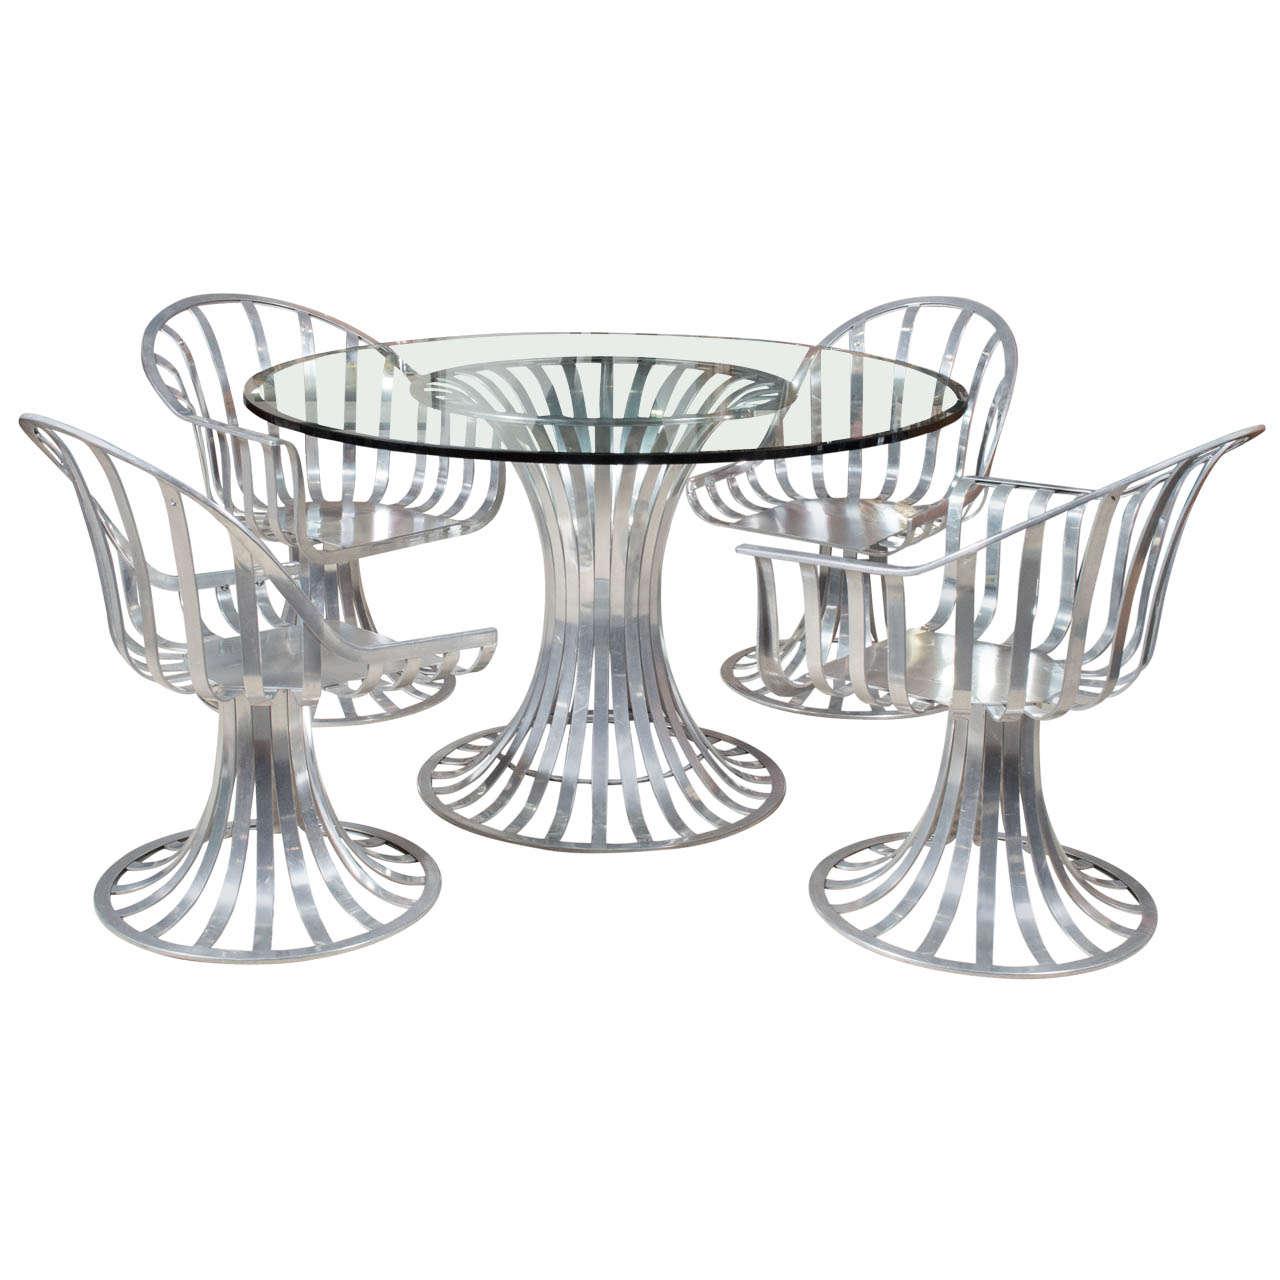 Russell Woodard Aluminum Patio Furniture Table And Two Chairs At - Woodard aluminum patio furniture